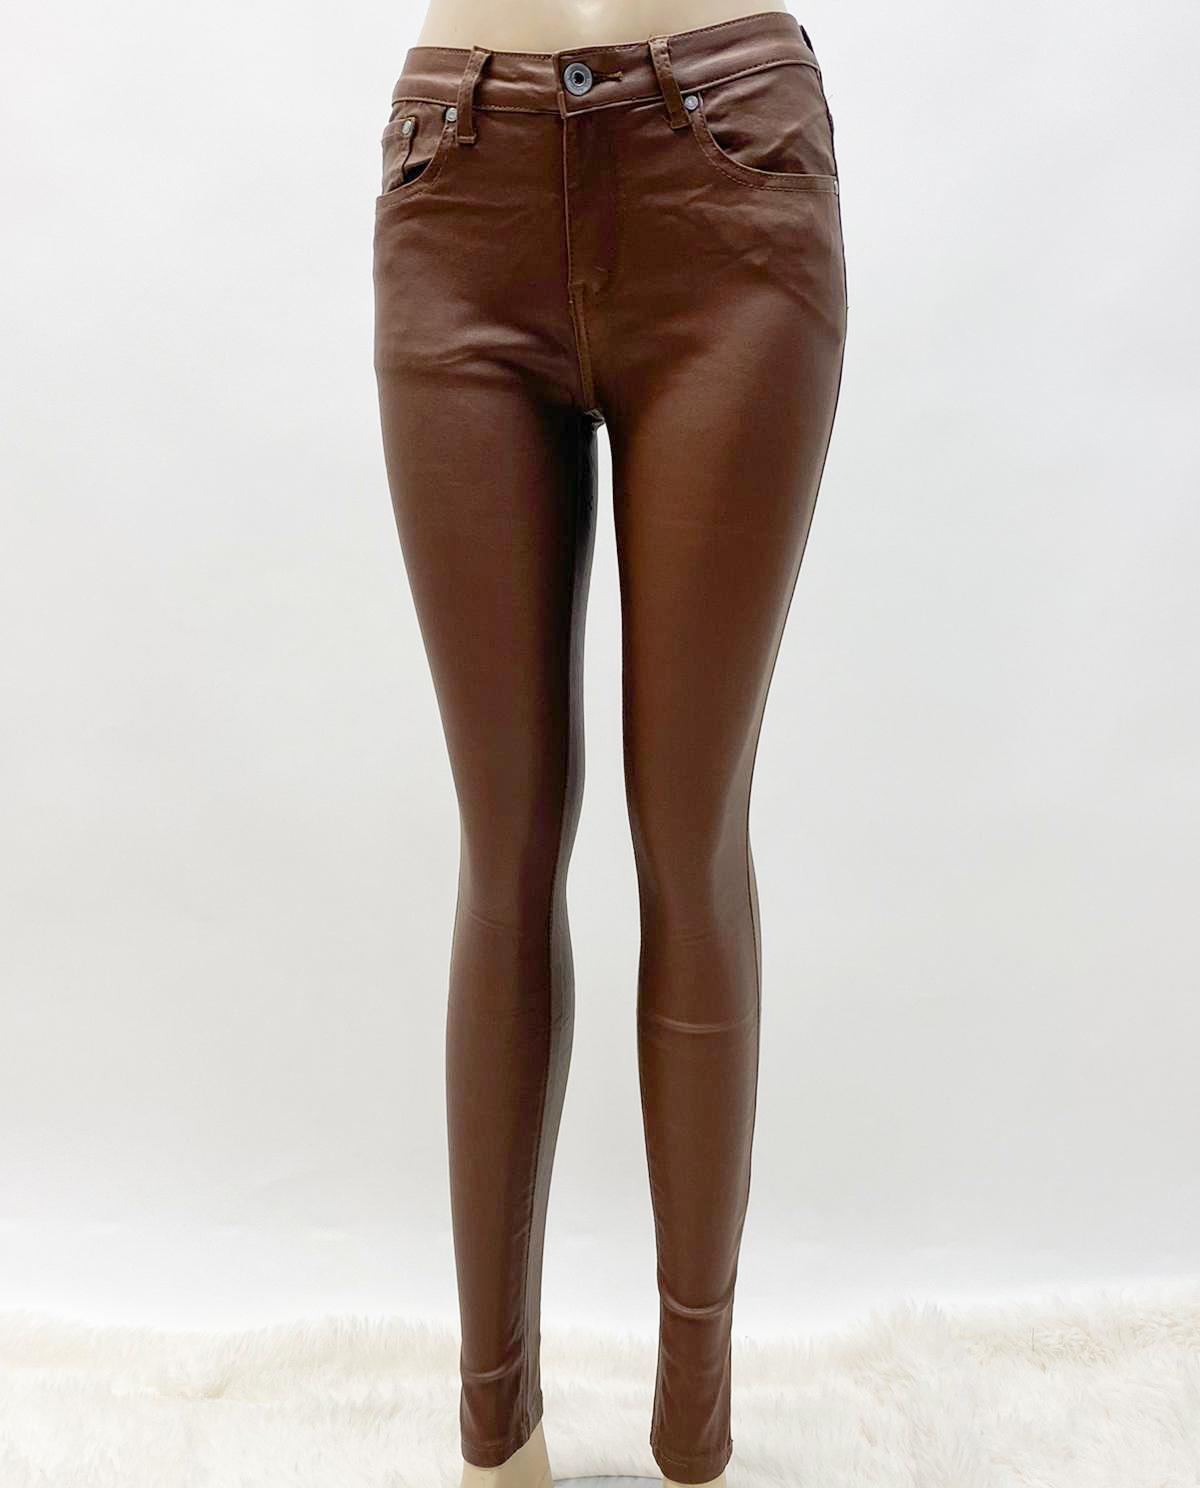 Jeans braun in Lackoptik matt